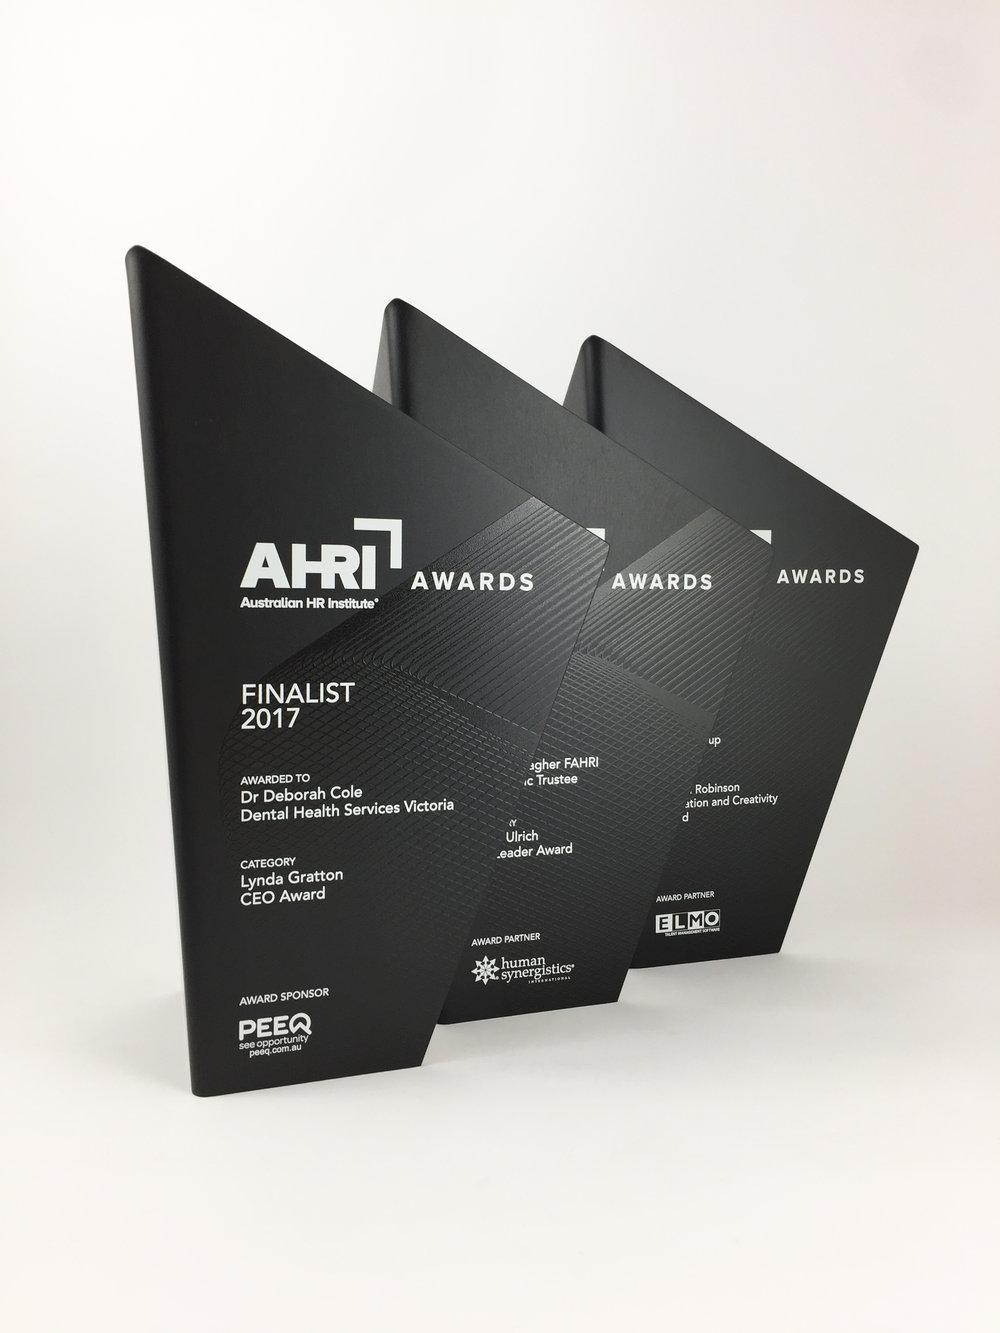 AHRI-aluminium-graphic-trophy-award-03.jpg